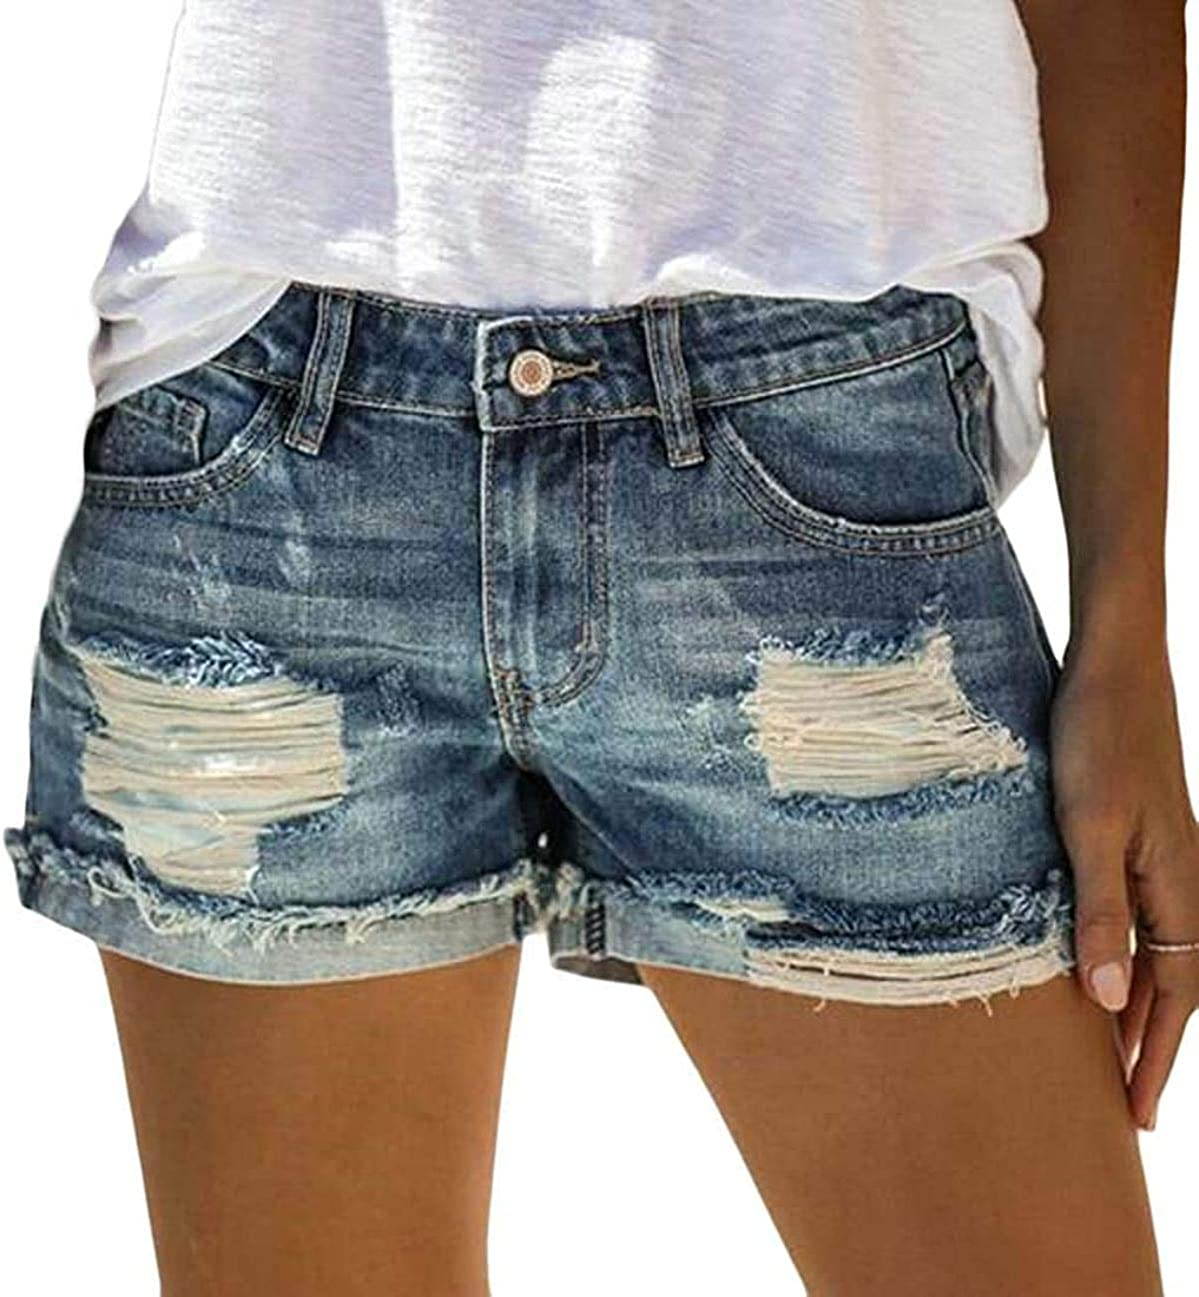 JNBGYAPS Women Summer Mid Waist Ripped Destroyed Denim Shorts Jeans